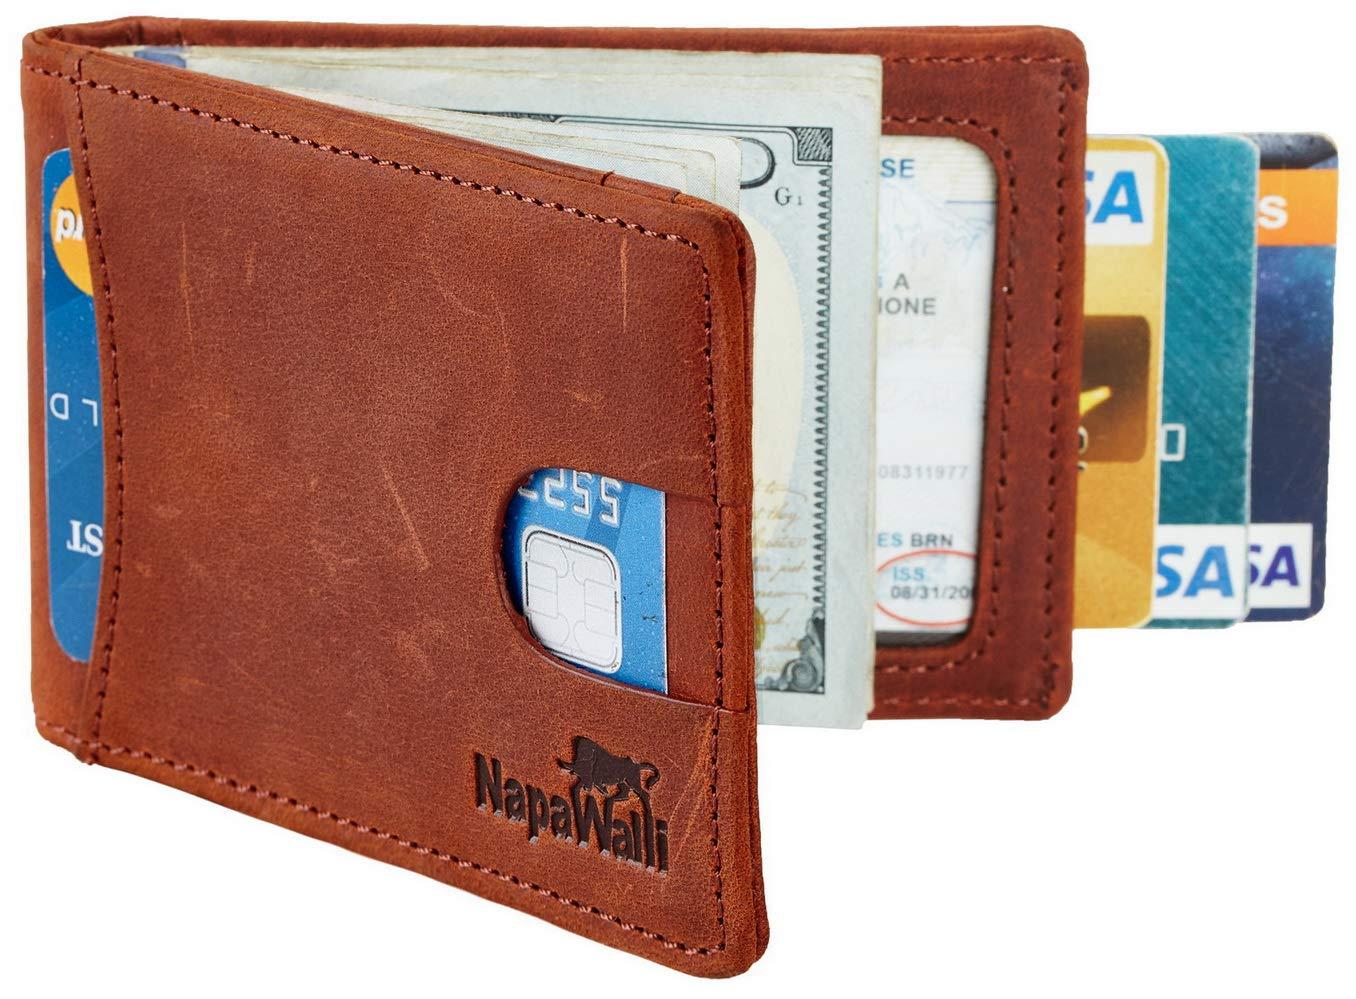 NapaWalli RFID Blocking Bifold Slim Genuine Leather Thin Minimalist Front Pocket Wallets for Men Money Clip (02 crazy horse deep brown hunter)